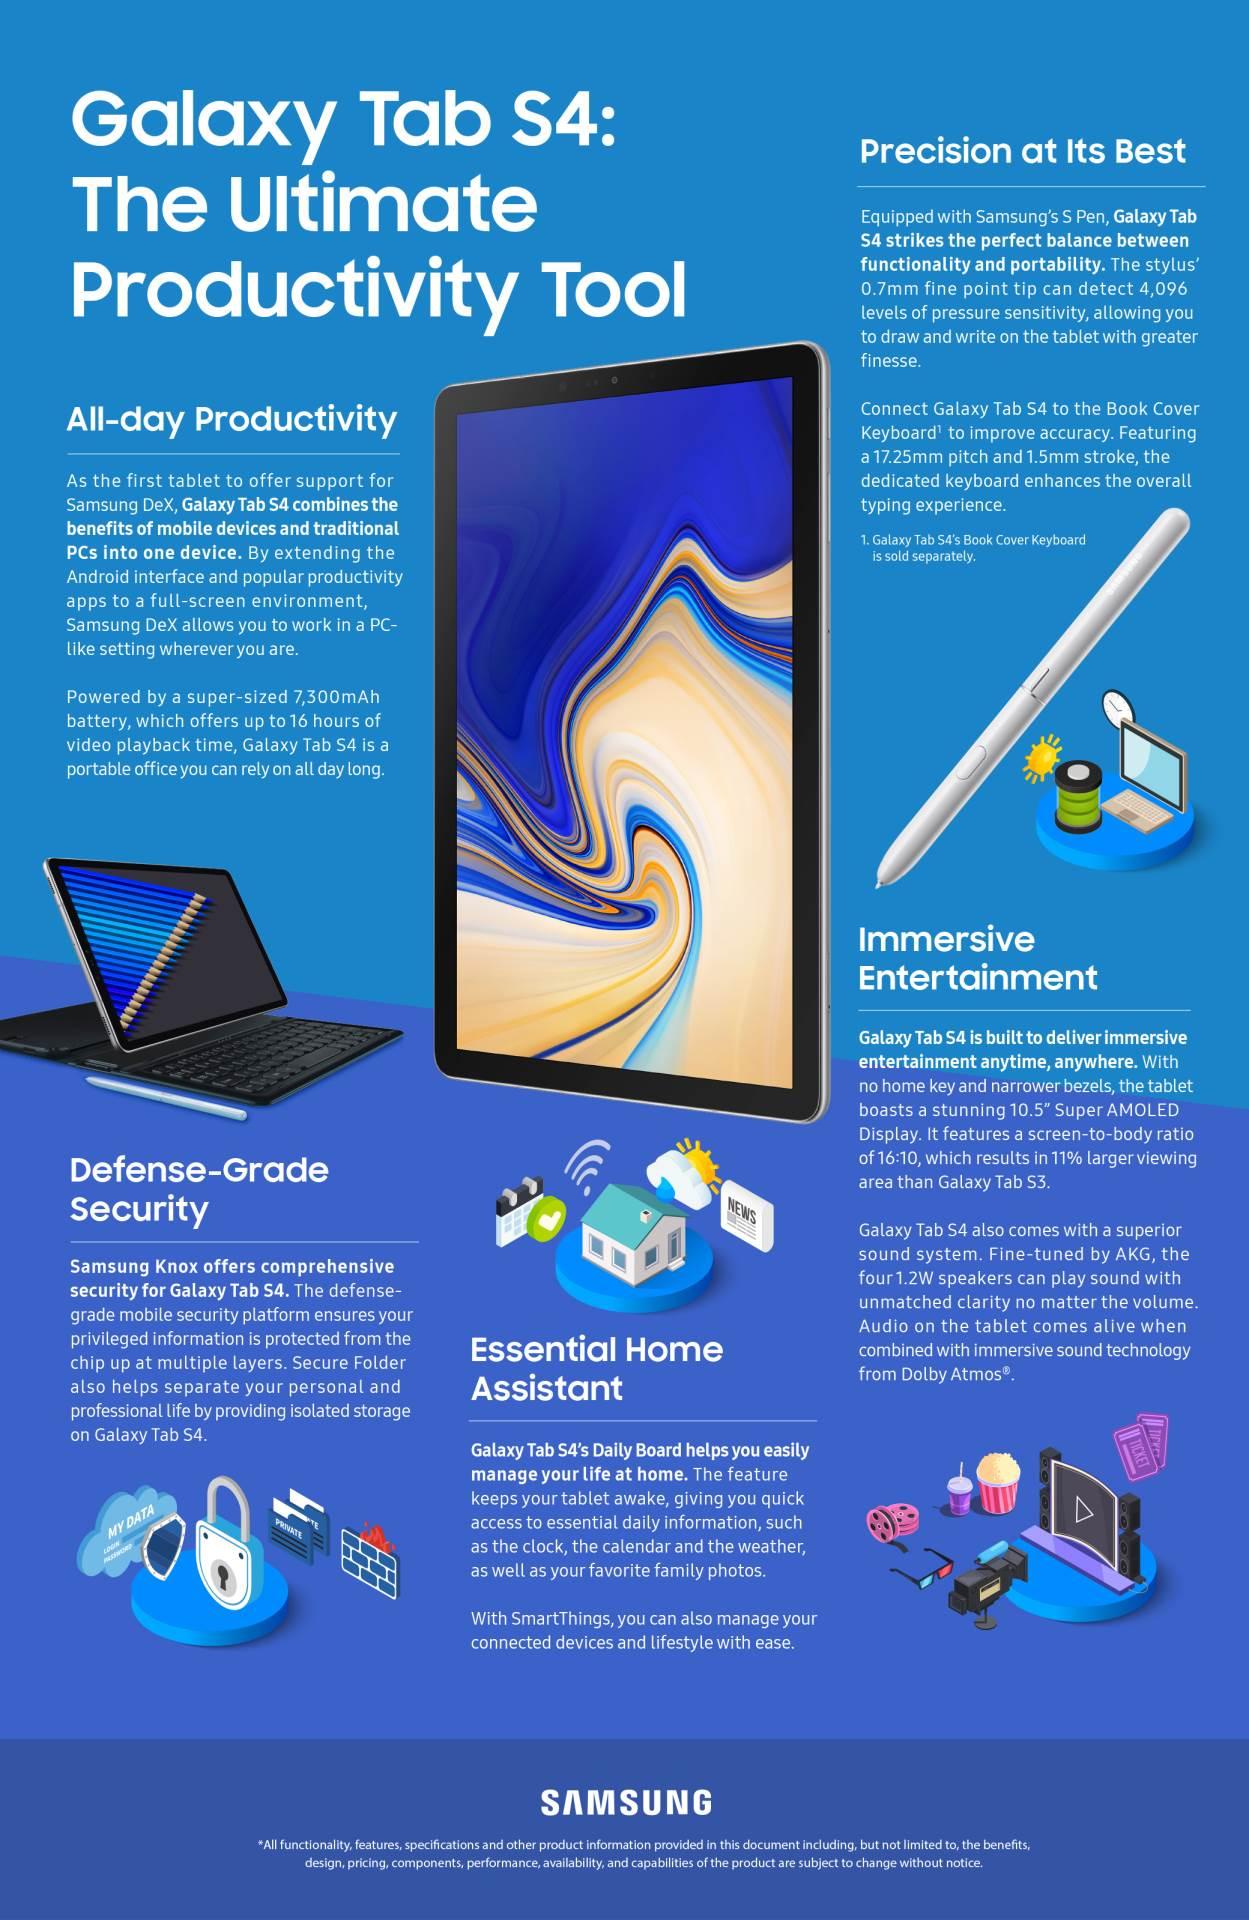 Samsung Galaxy Tab S4 cena u Srbiji, prodaja, kupovina Galaxy Tab S4 cena, Galaxy Tab S4 kupovina